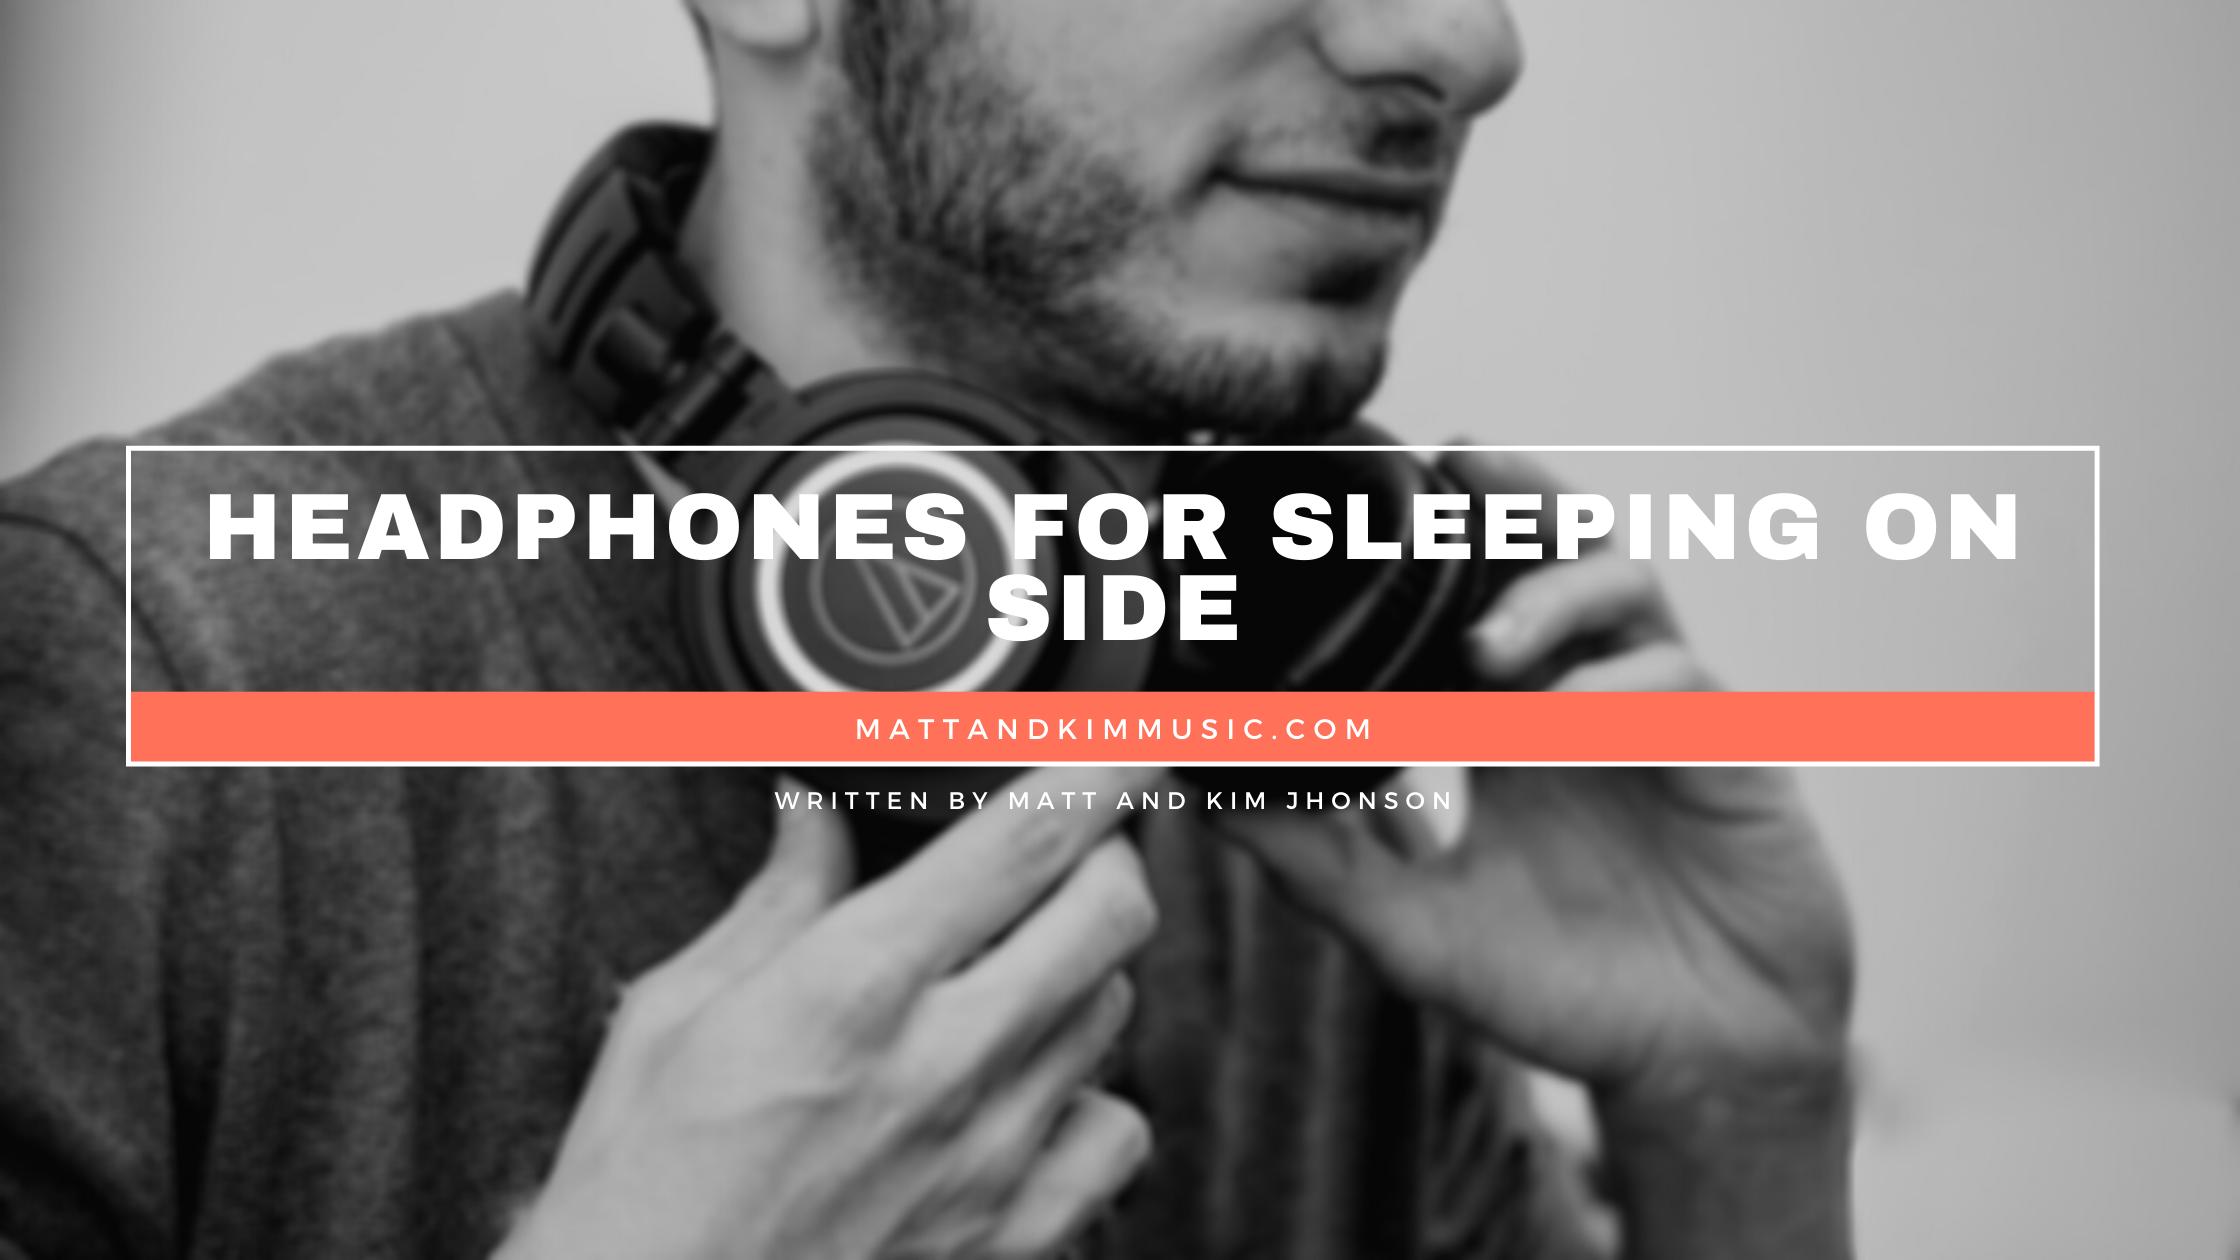 headphones for sleeping on side